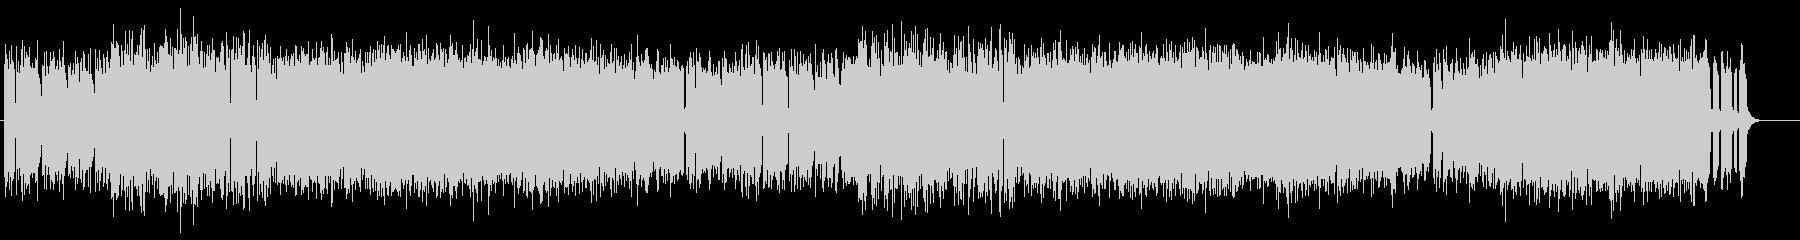 「HR/HM」「DARK」BGM309の未再生の波形